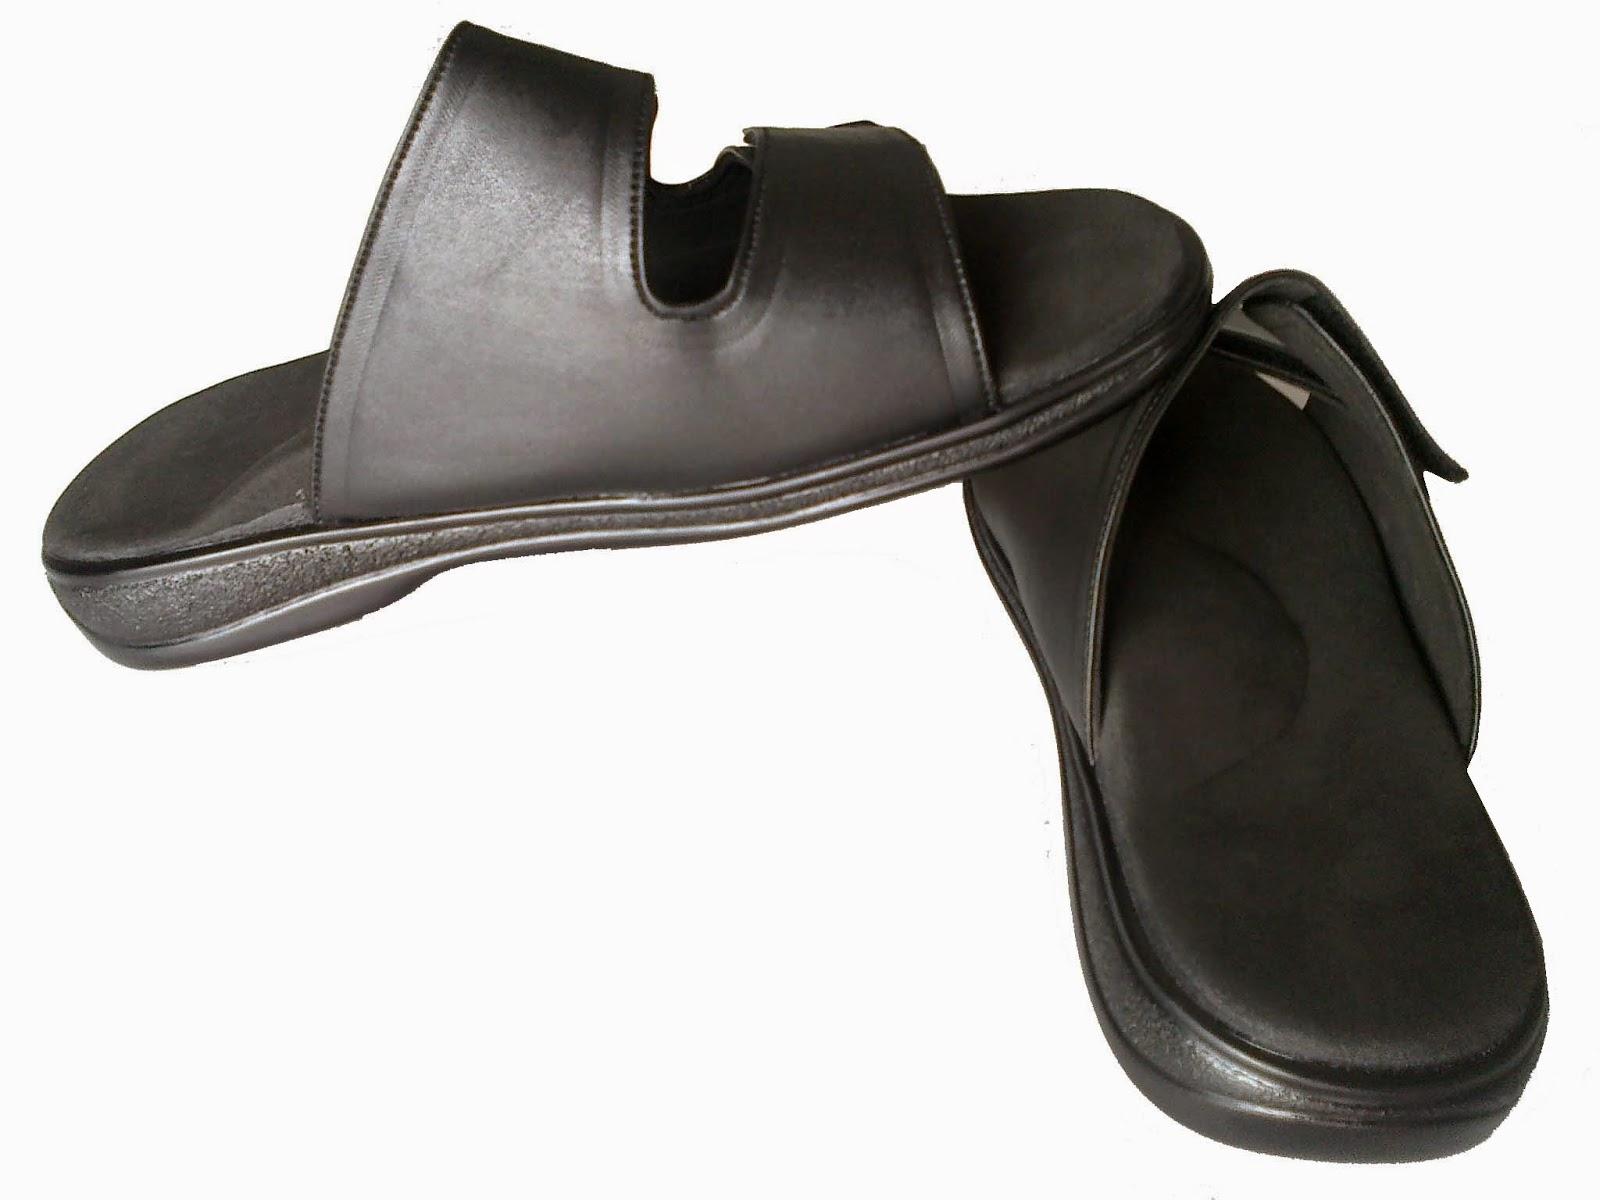 Preventive Mcp Footwear For Diabetic Patients